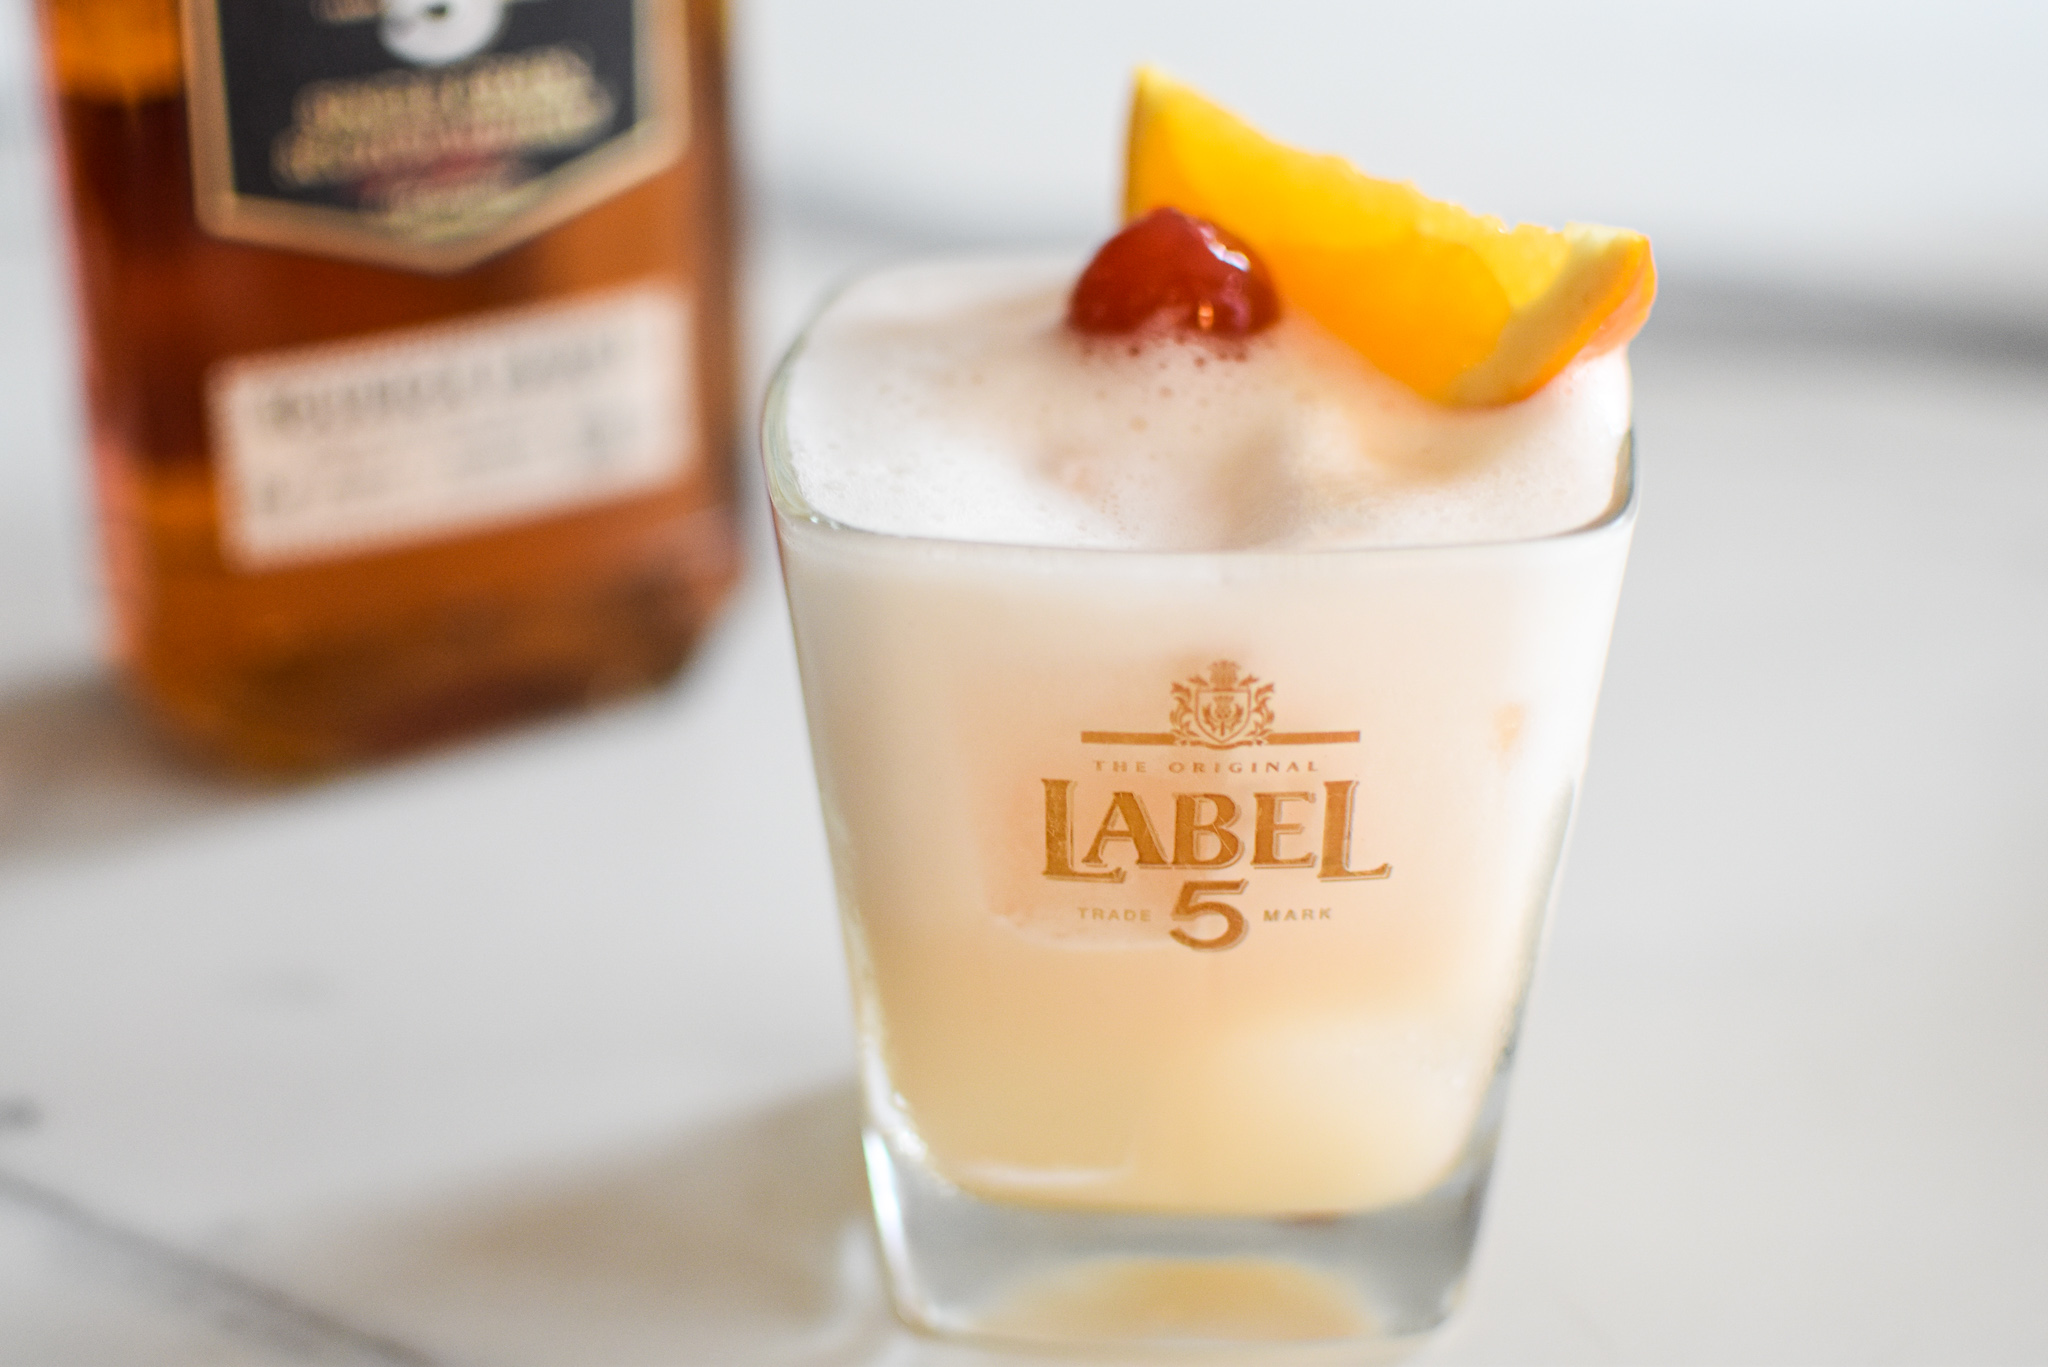 Pastis - whisky sour